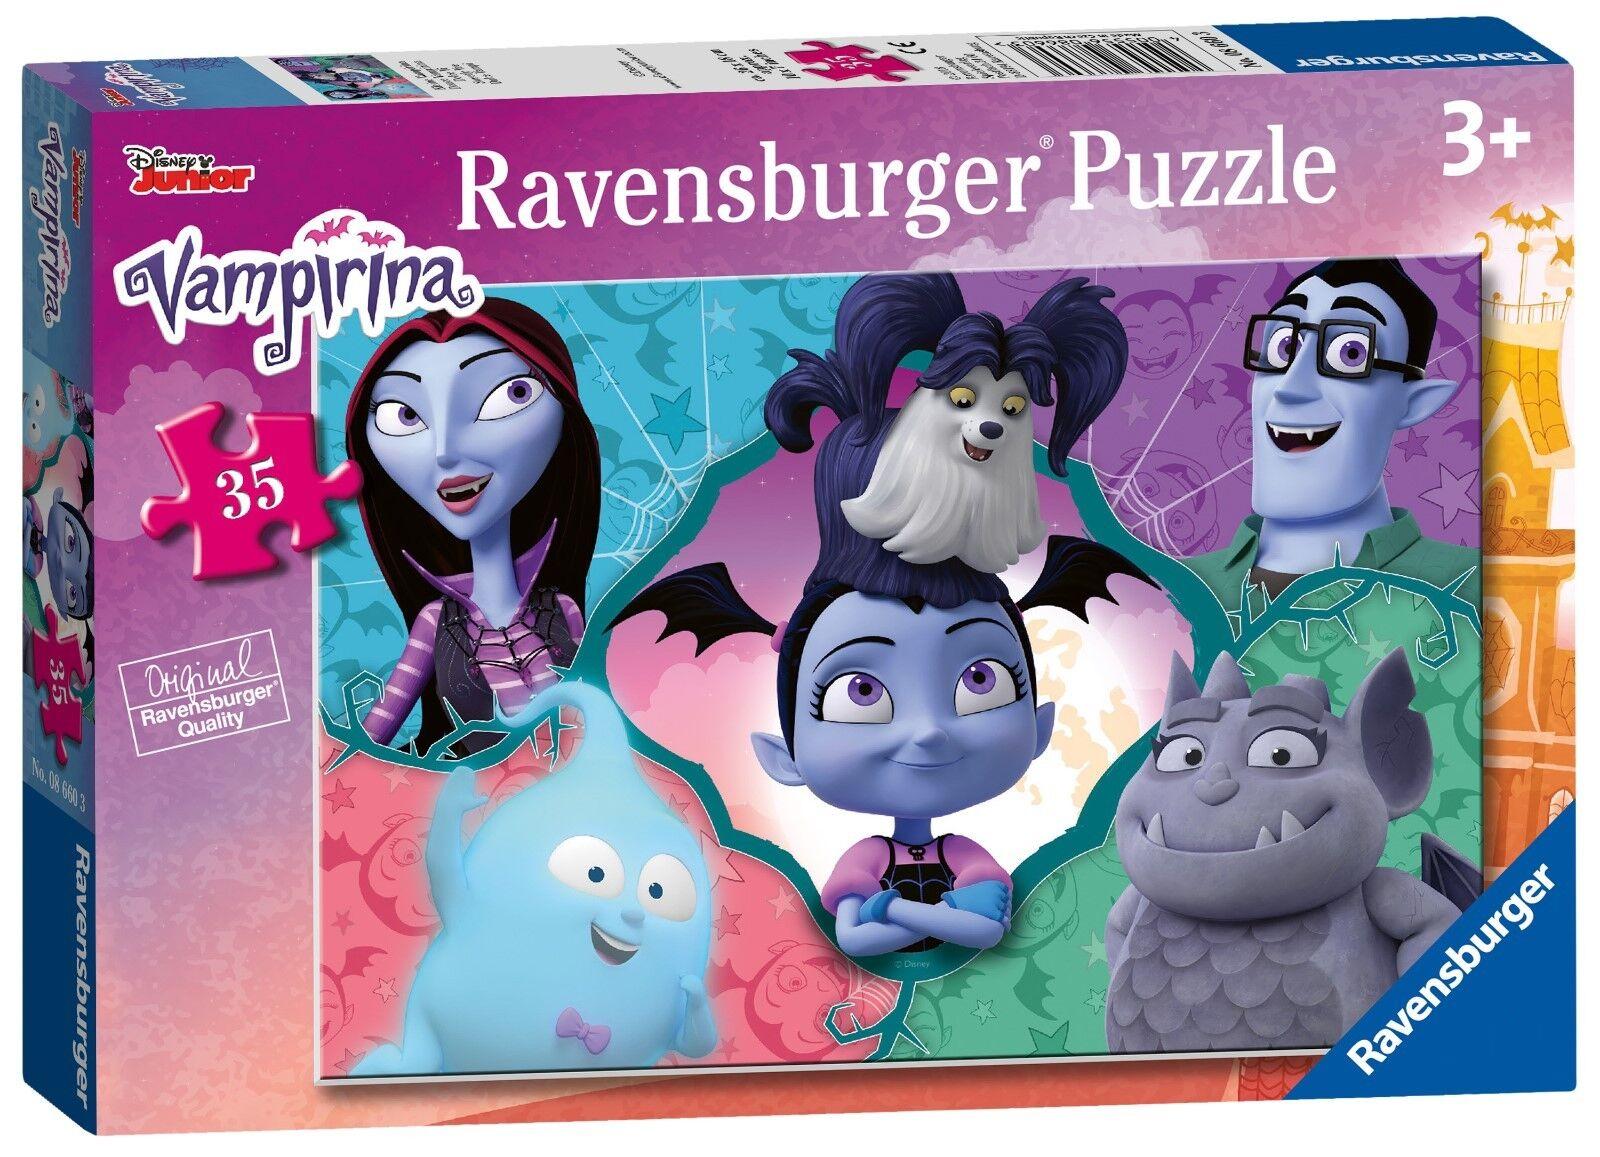 New! Ravensburger Vampirina 35 Piece Disney Jigsaw Puzzle 3+ 08660